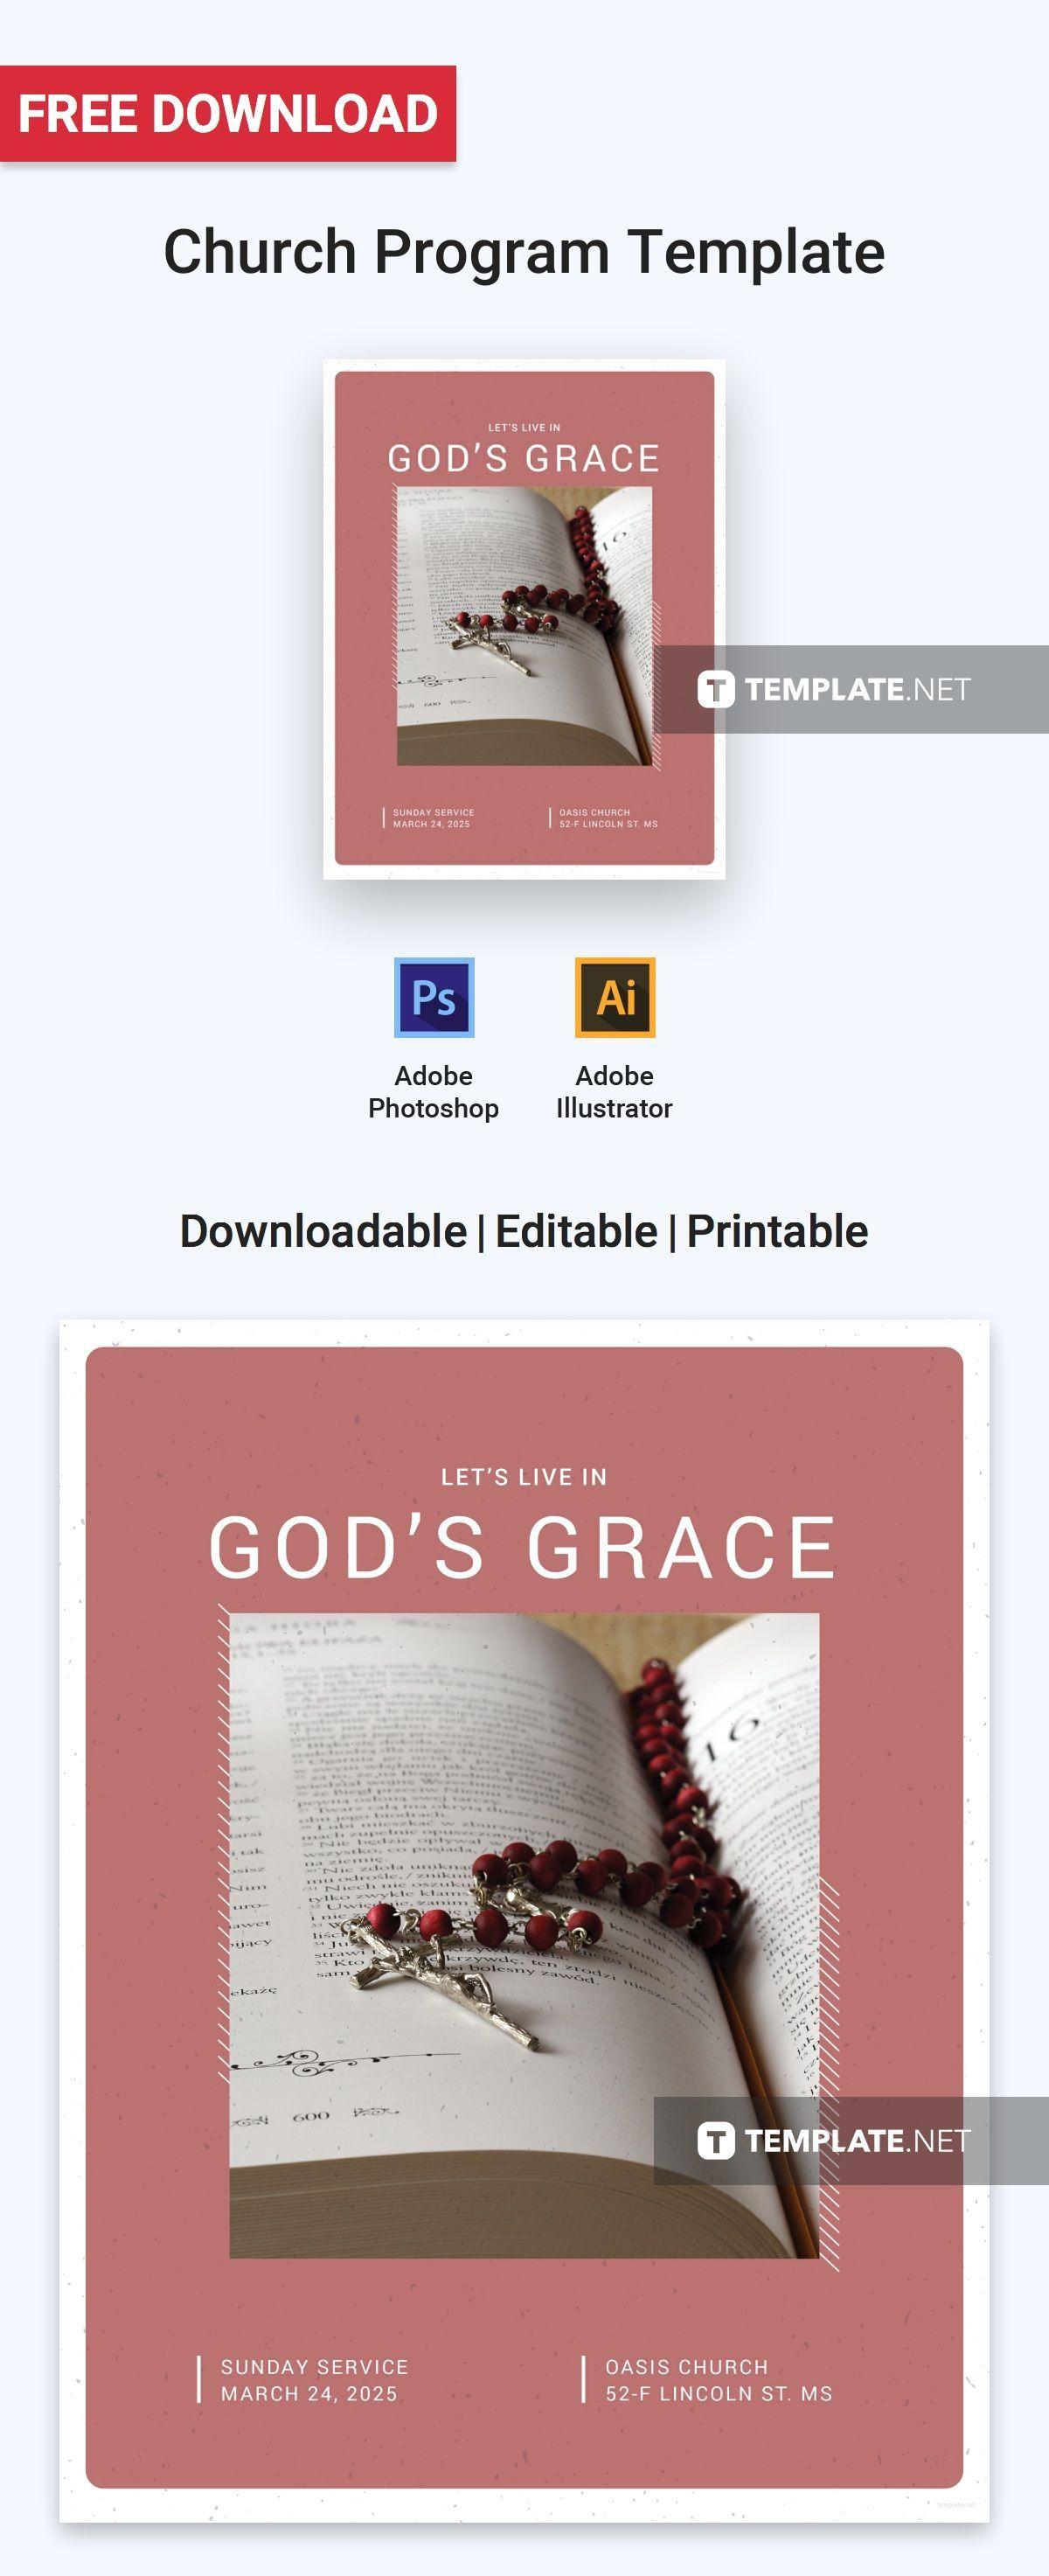 001 Fantastic Free Church Program Template Microsoft Publisher Highest Quality Full